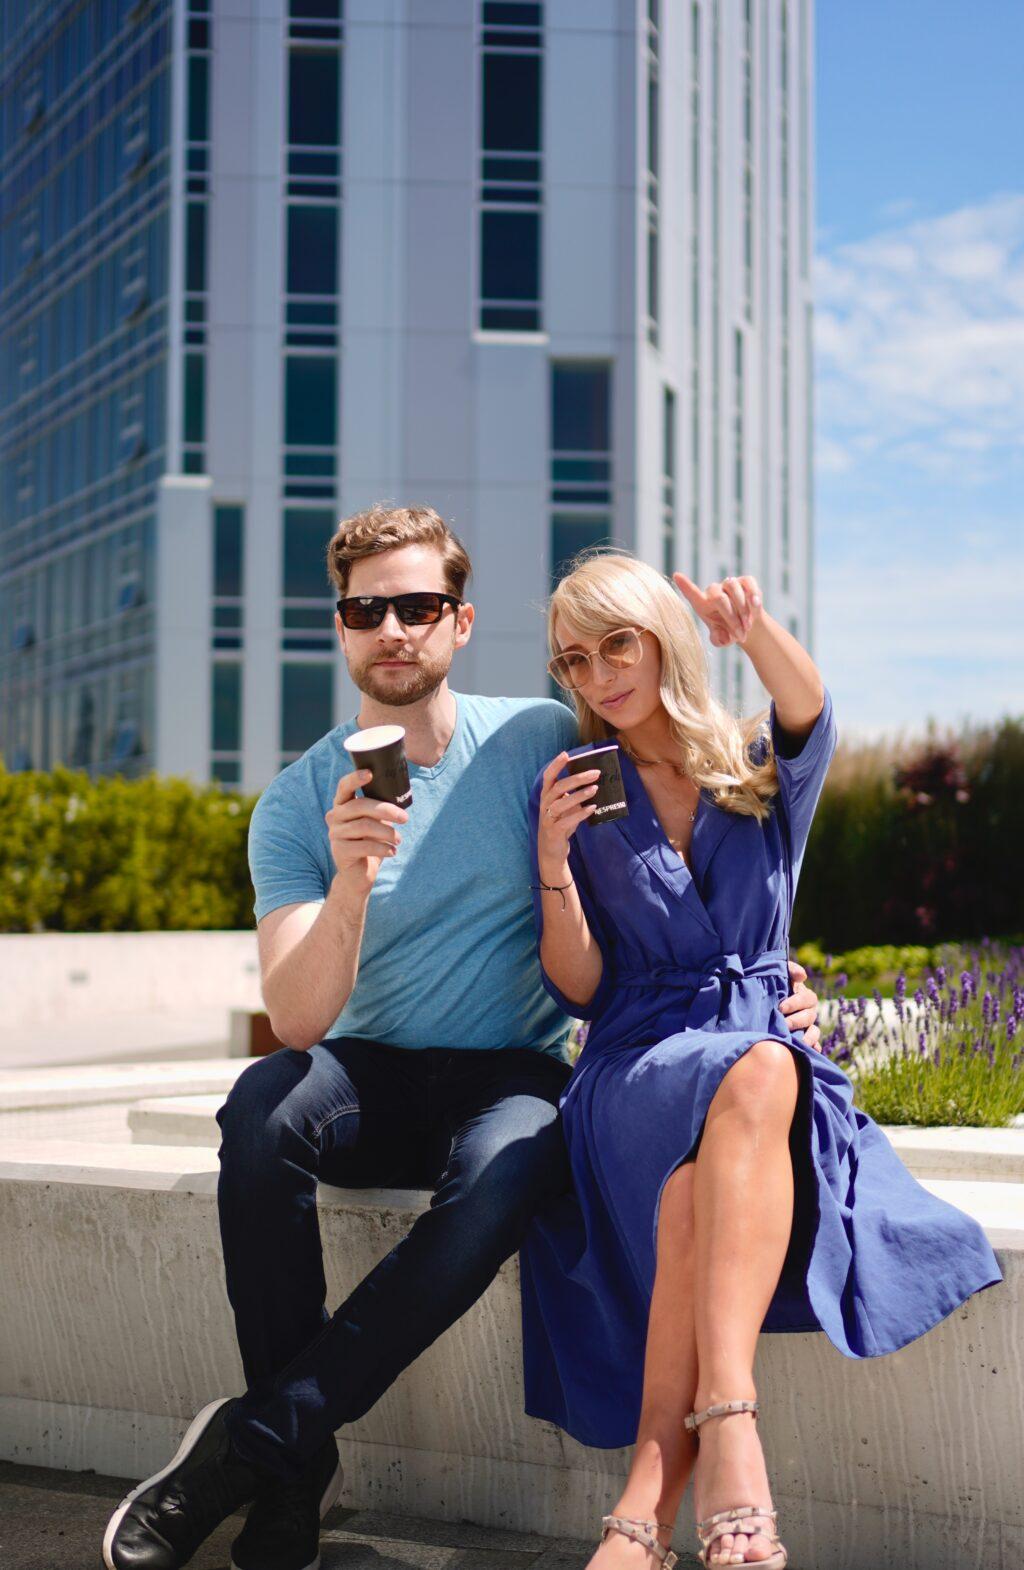 Couple on the Terrace